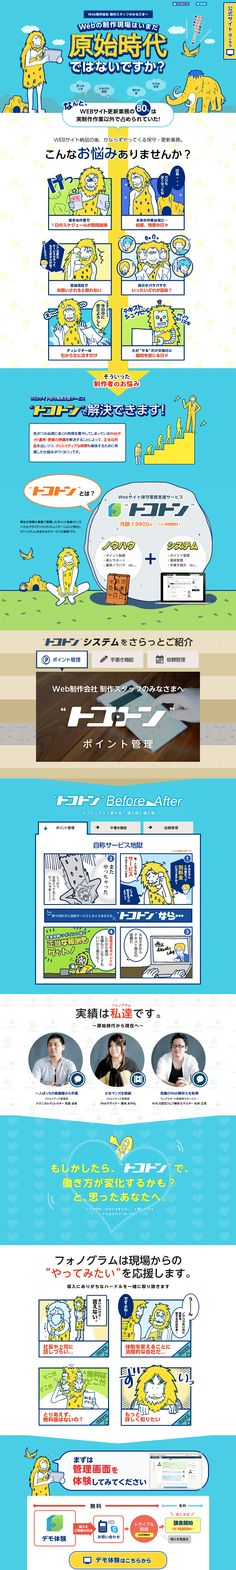 Site Design, Web Design, Landing, The Creator, Graphics, Japan, Illustrations, Content, Website